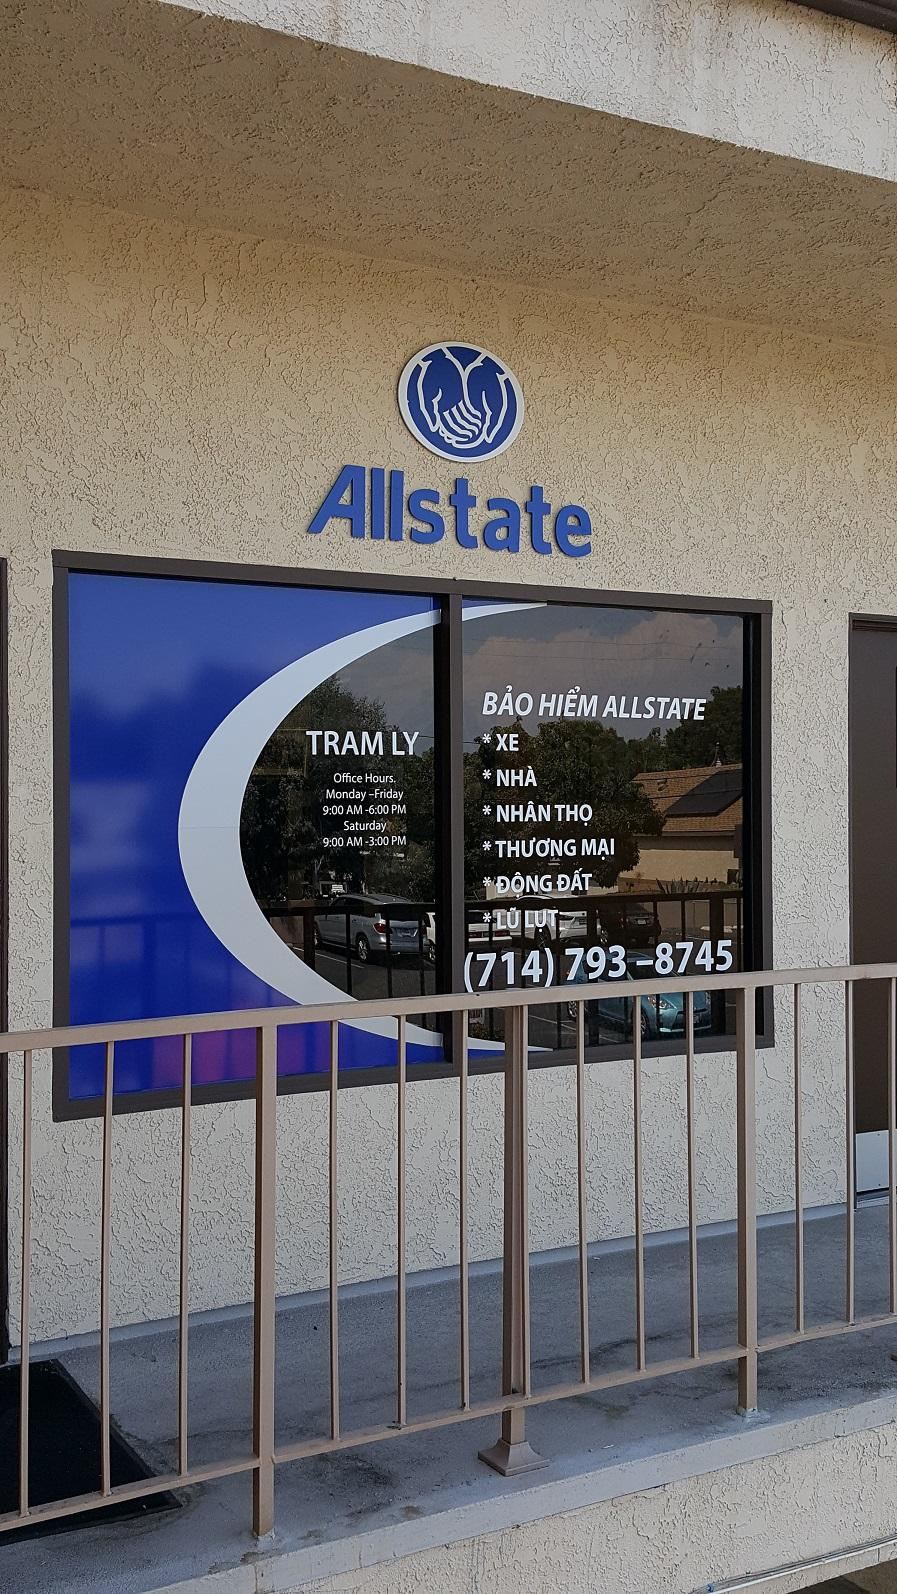 Allstate Insurance Agent: Tram Ly image 4